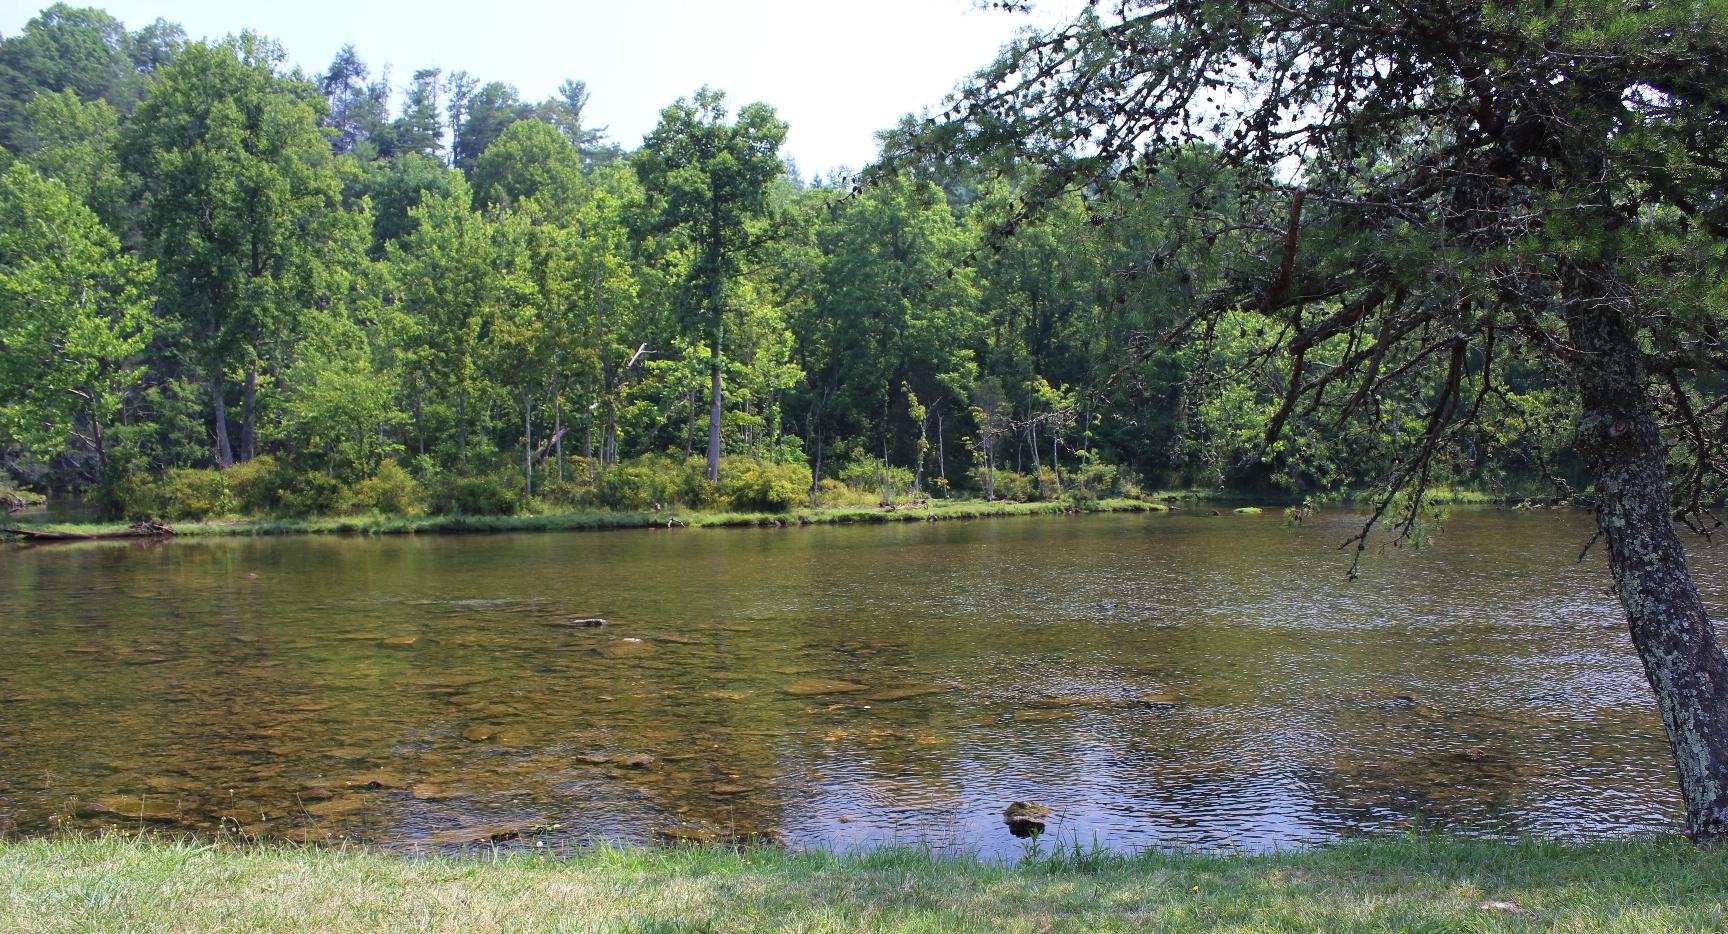 South Holston River Abingdon Outdoors